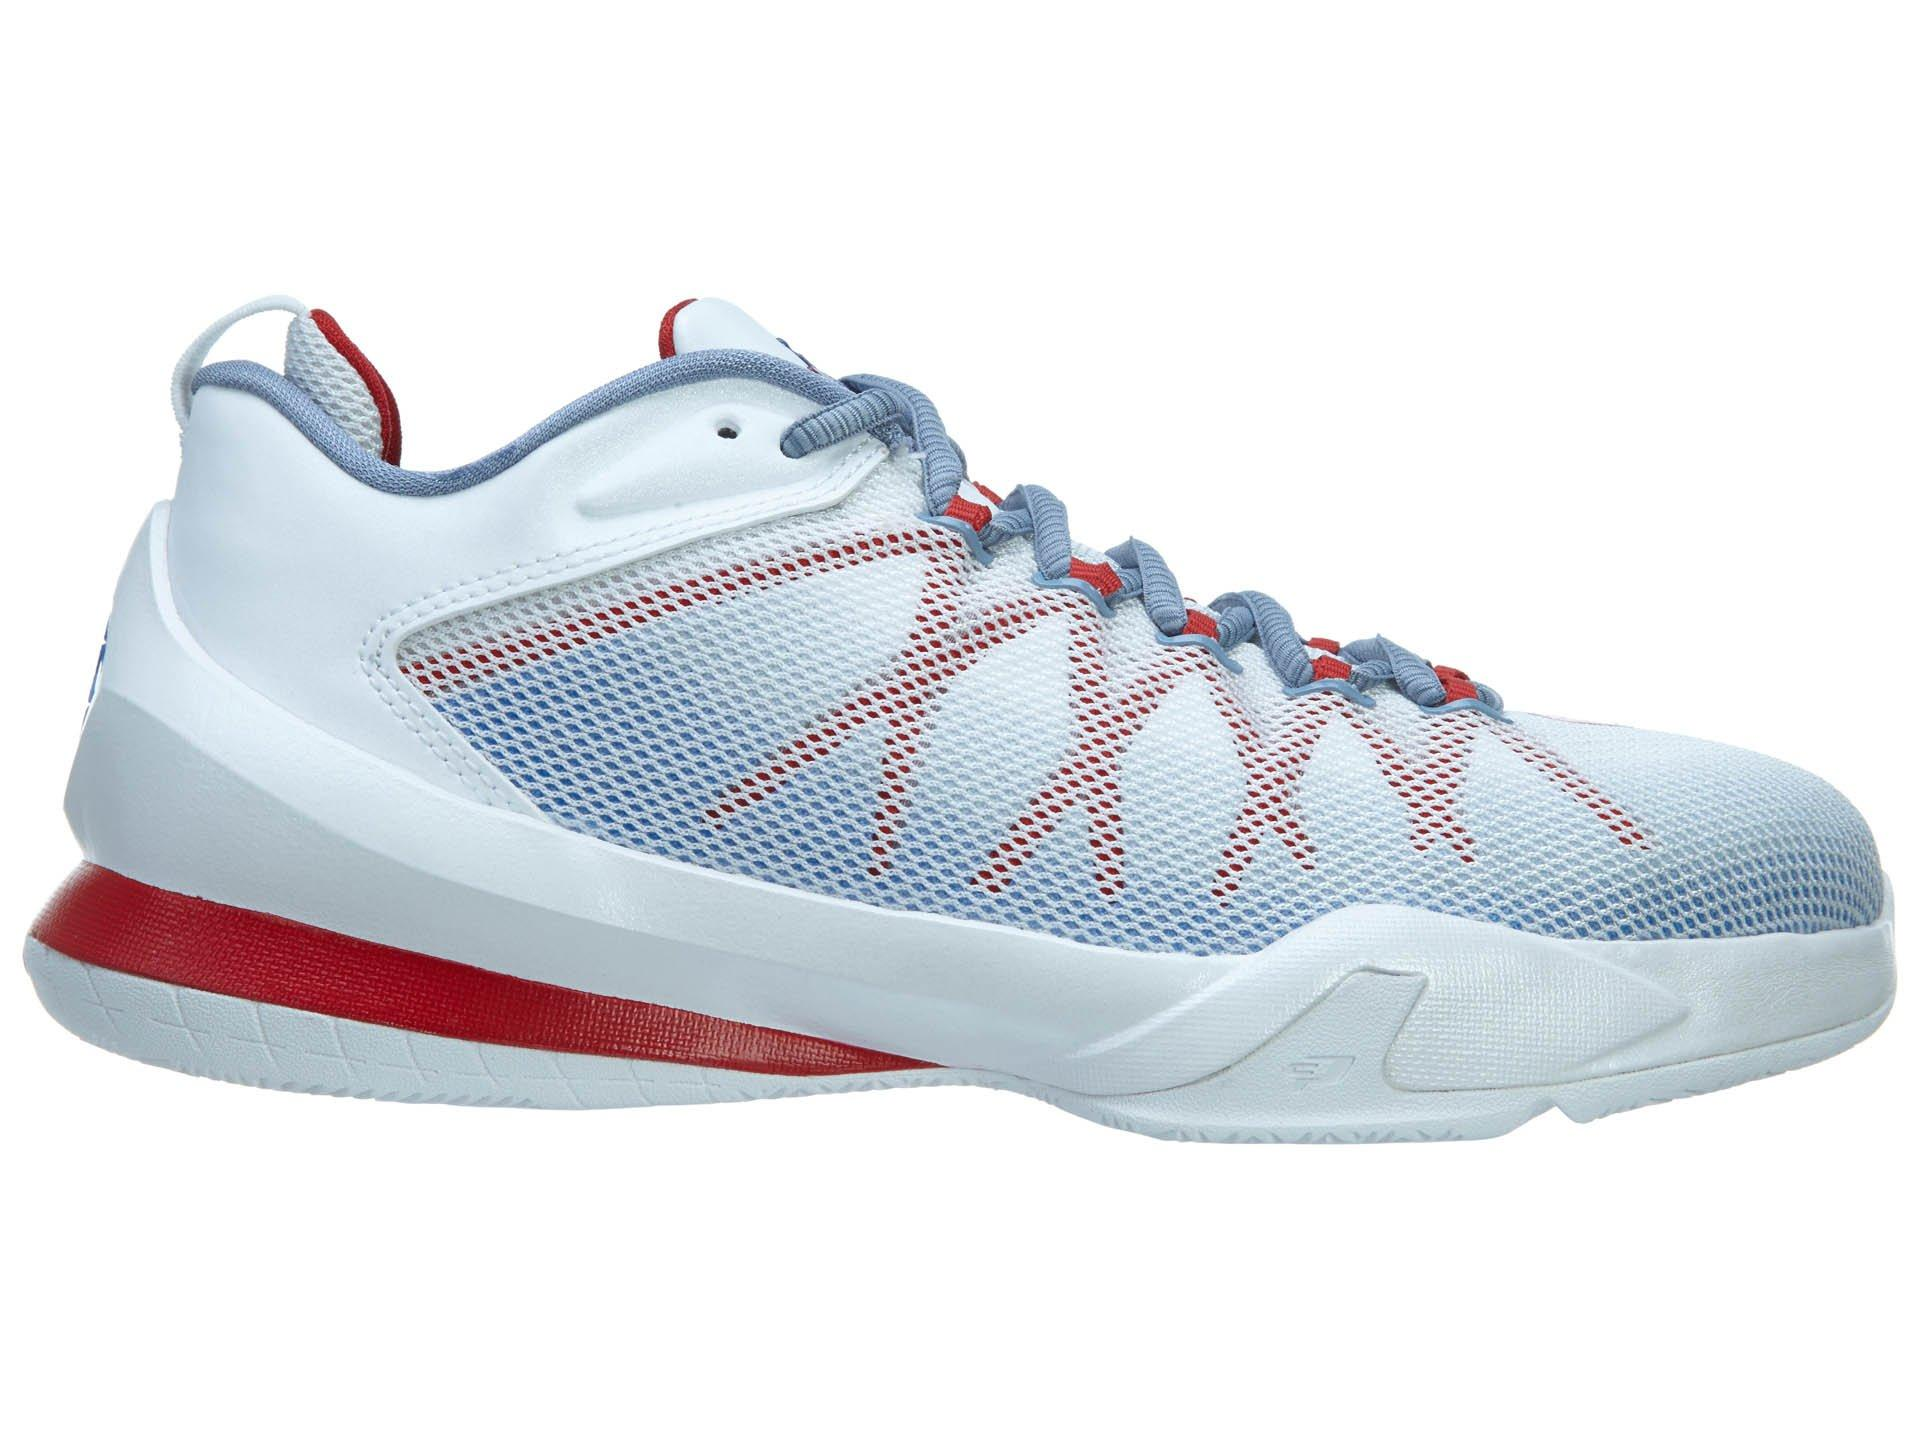 Jordan Cp3 Viii Ae Bg 725174-107 By Sneaker Zone (capitaland Merchant).